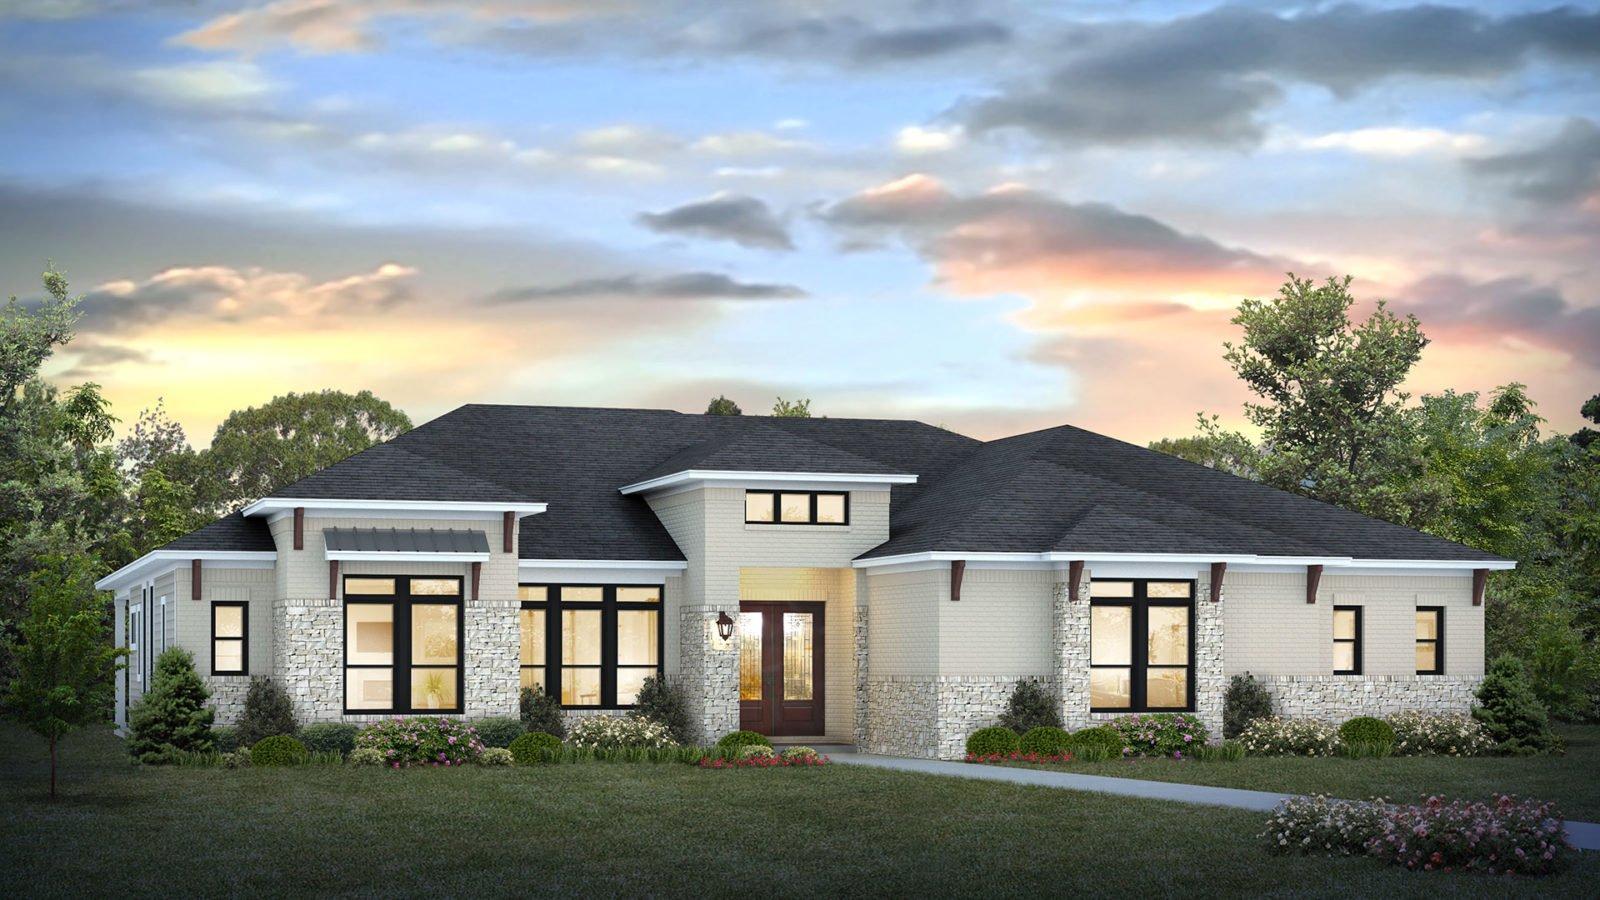 Central Indiana Home Builder Davis Homes